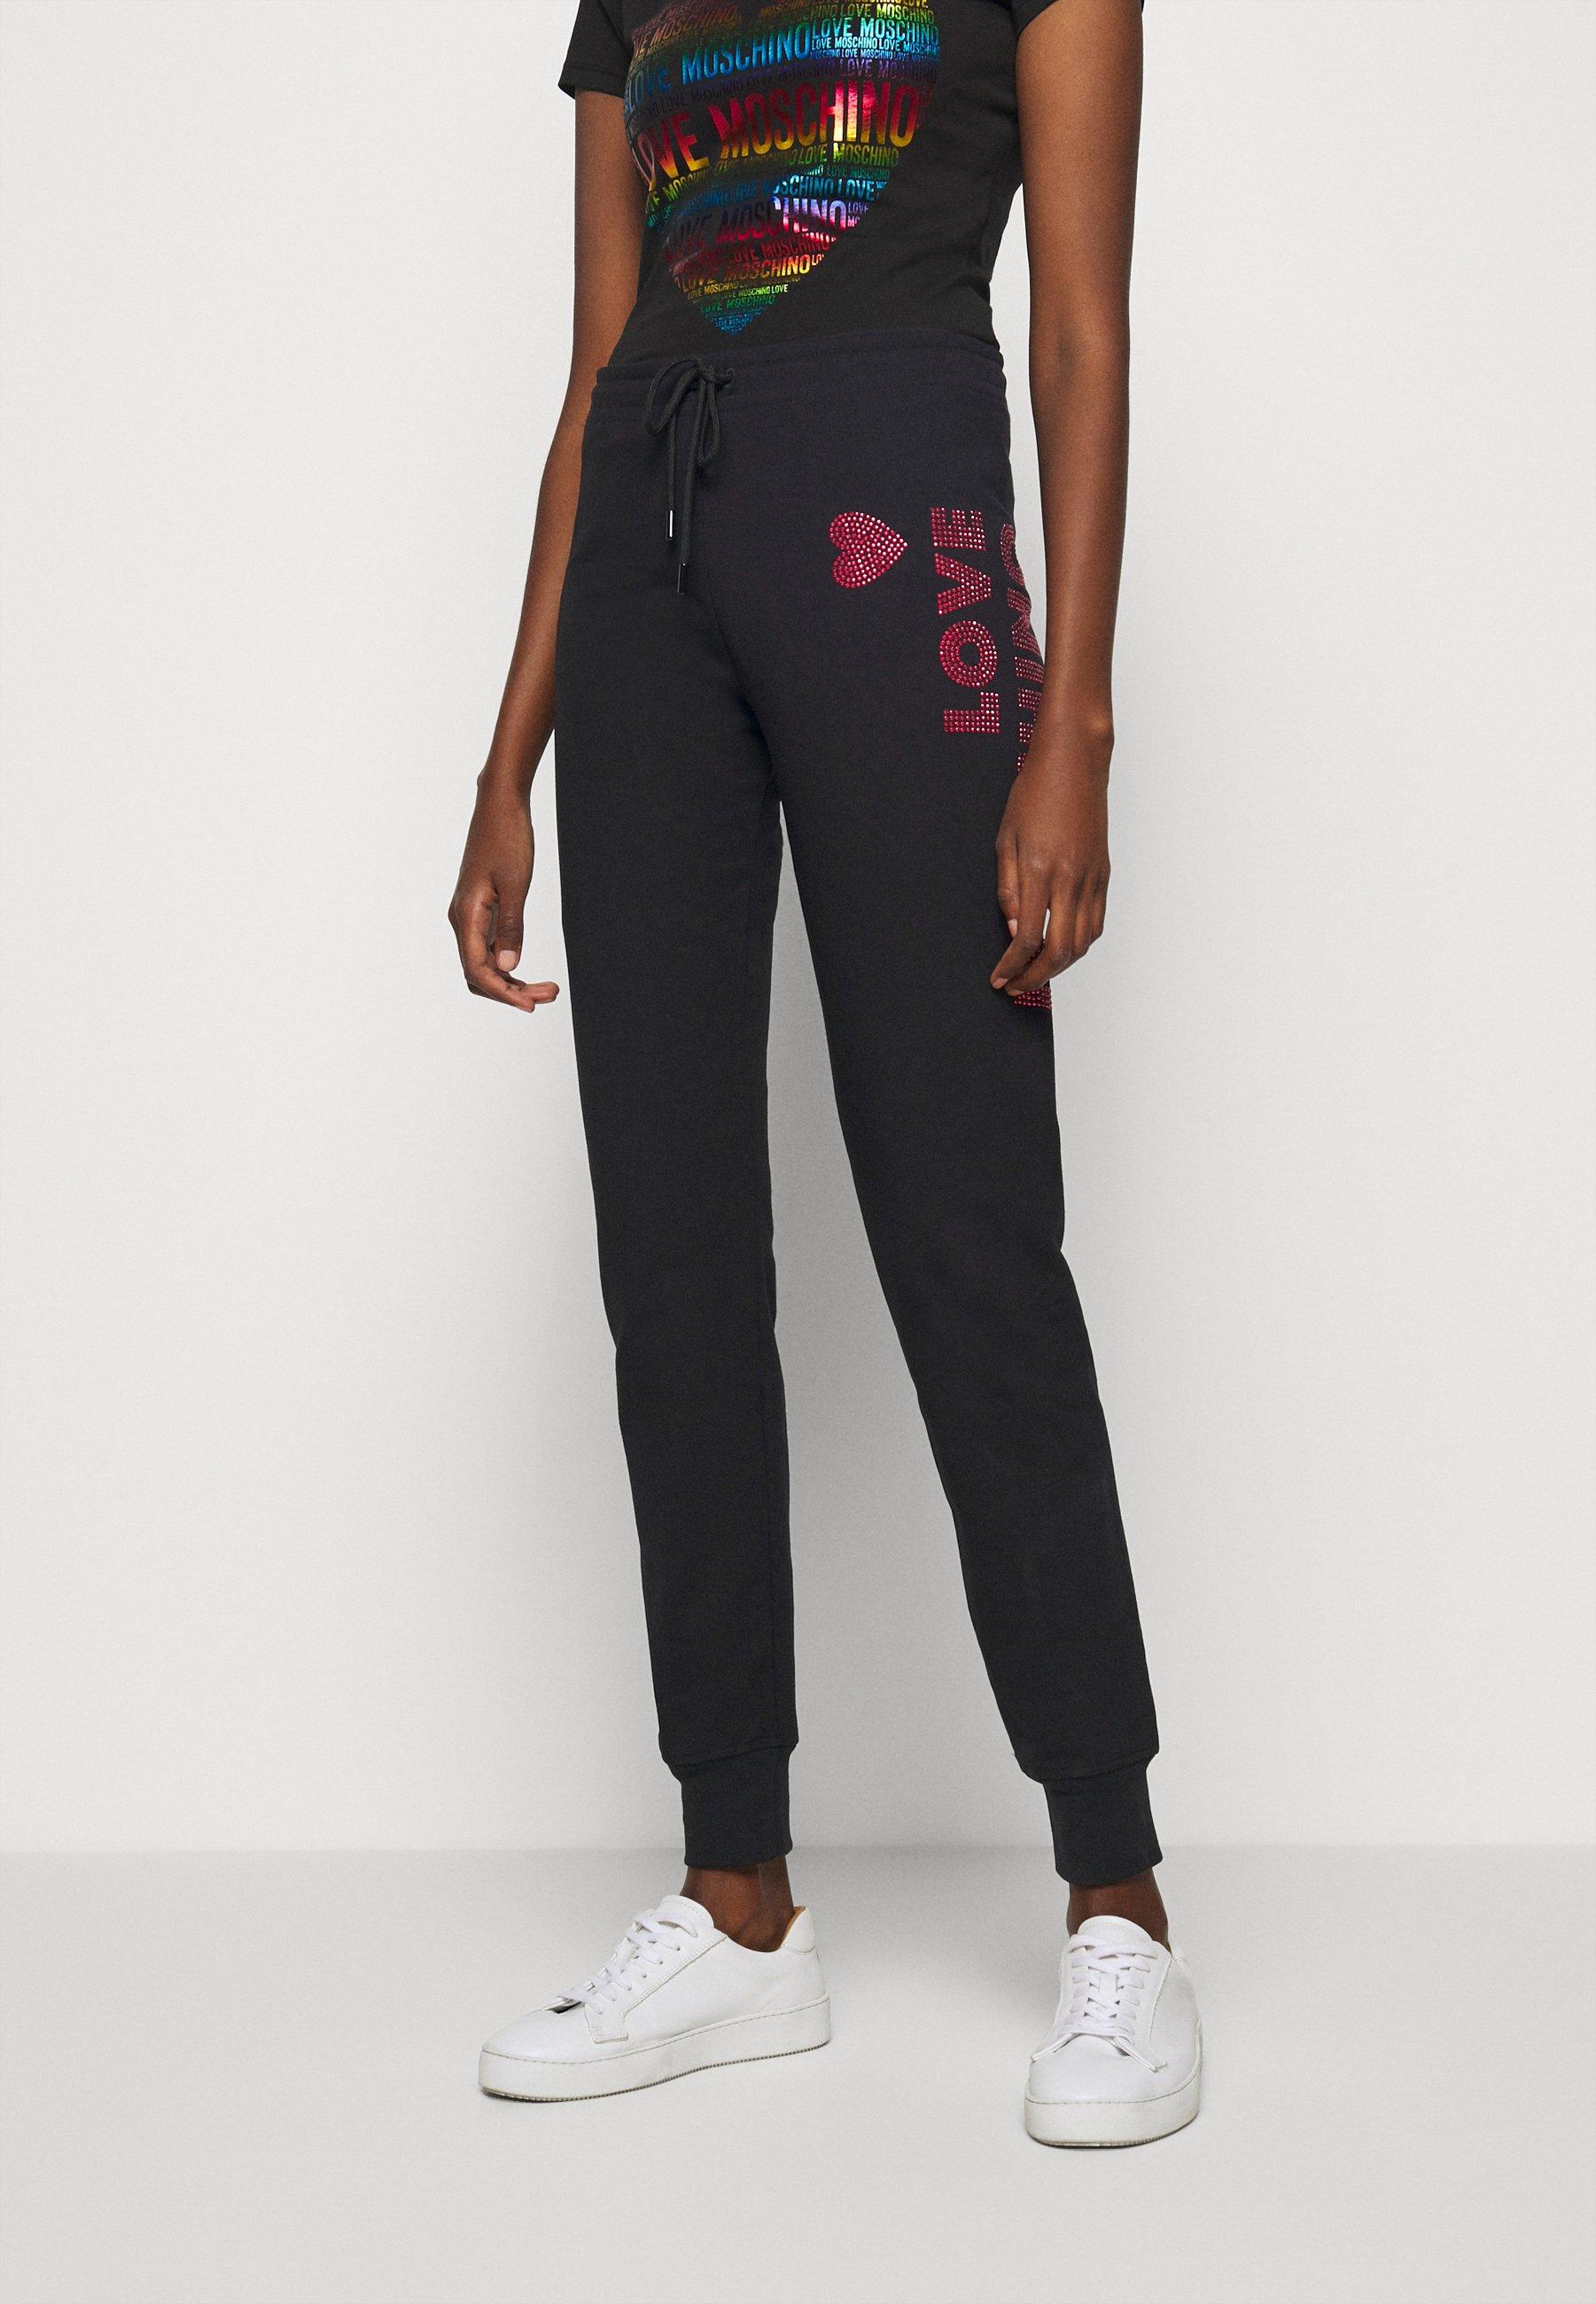 High-Quality Cheap Women's Clothing Love Moschino Tracksuit bottoms black ZyH2J2dJH